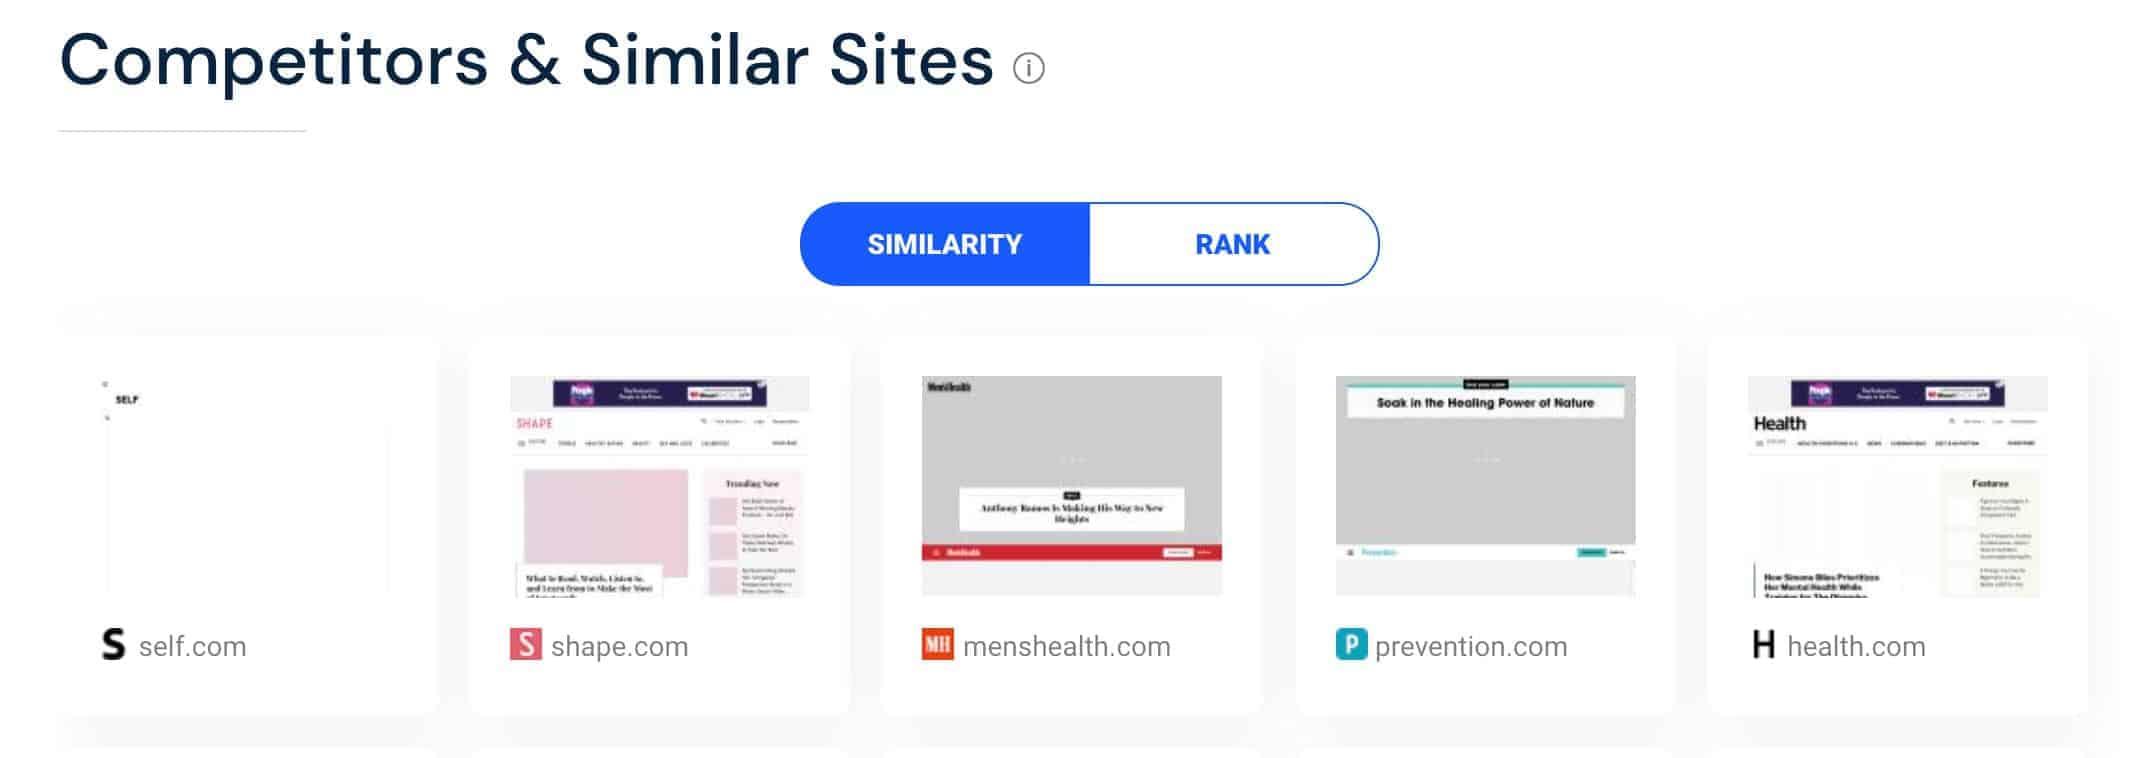 similarweb similar sites